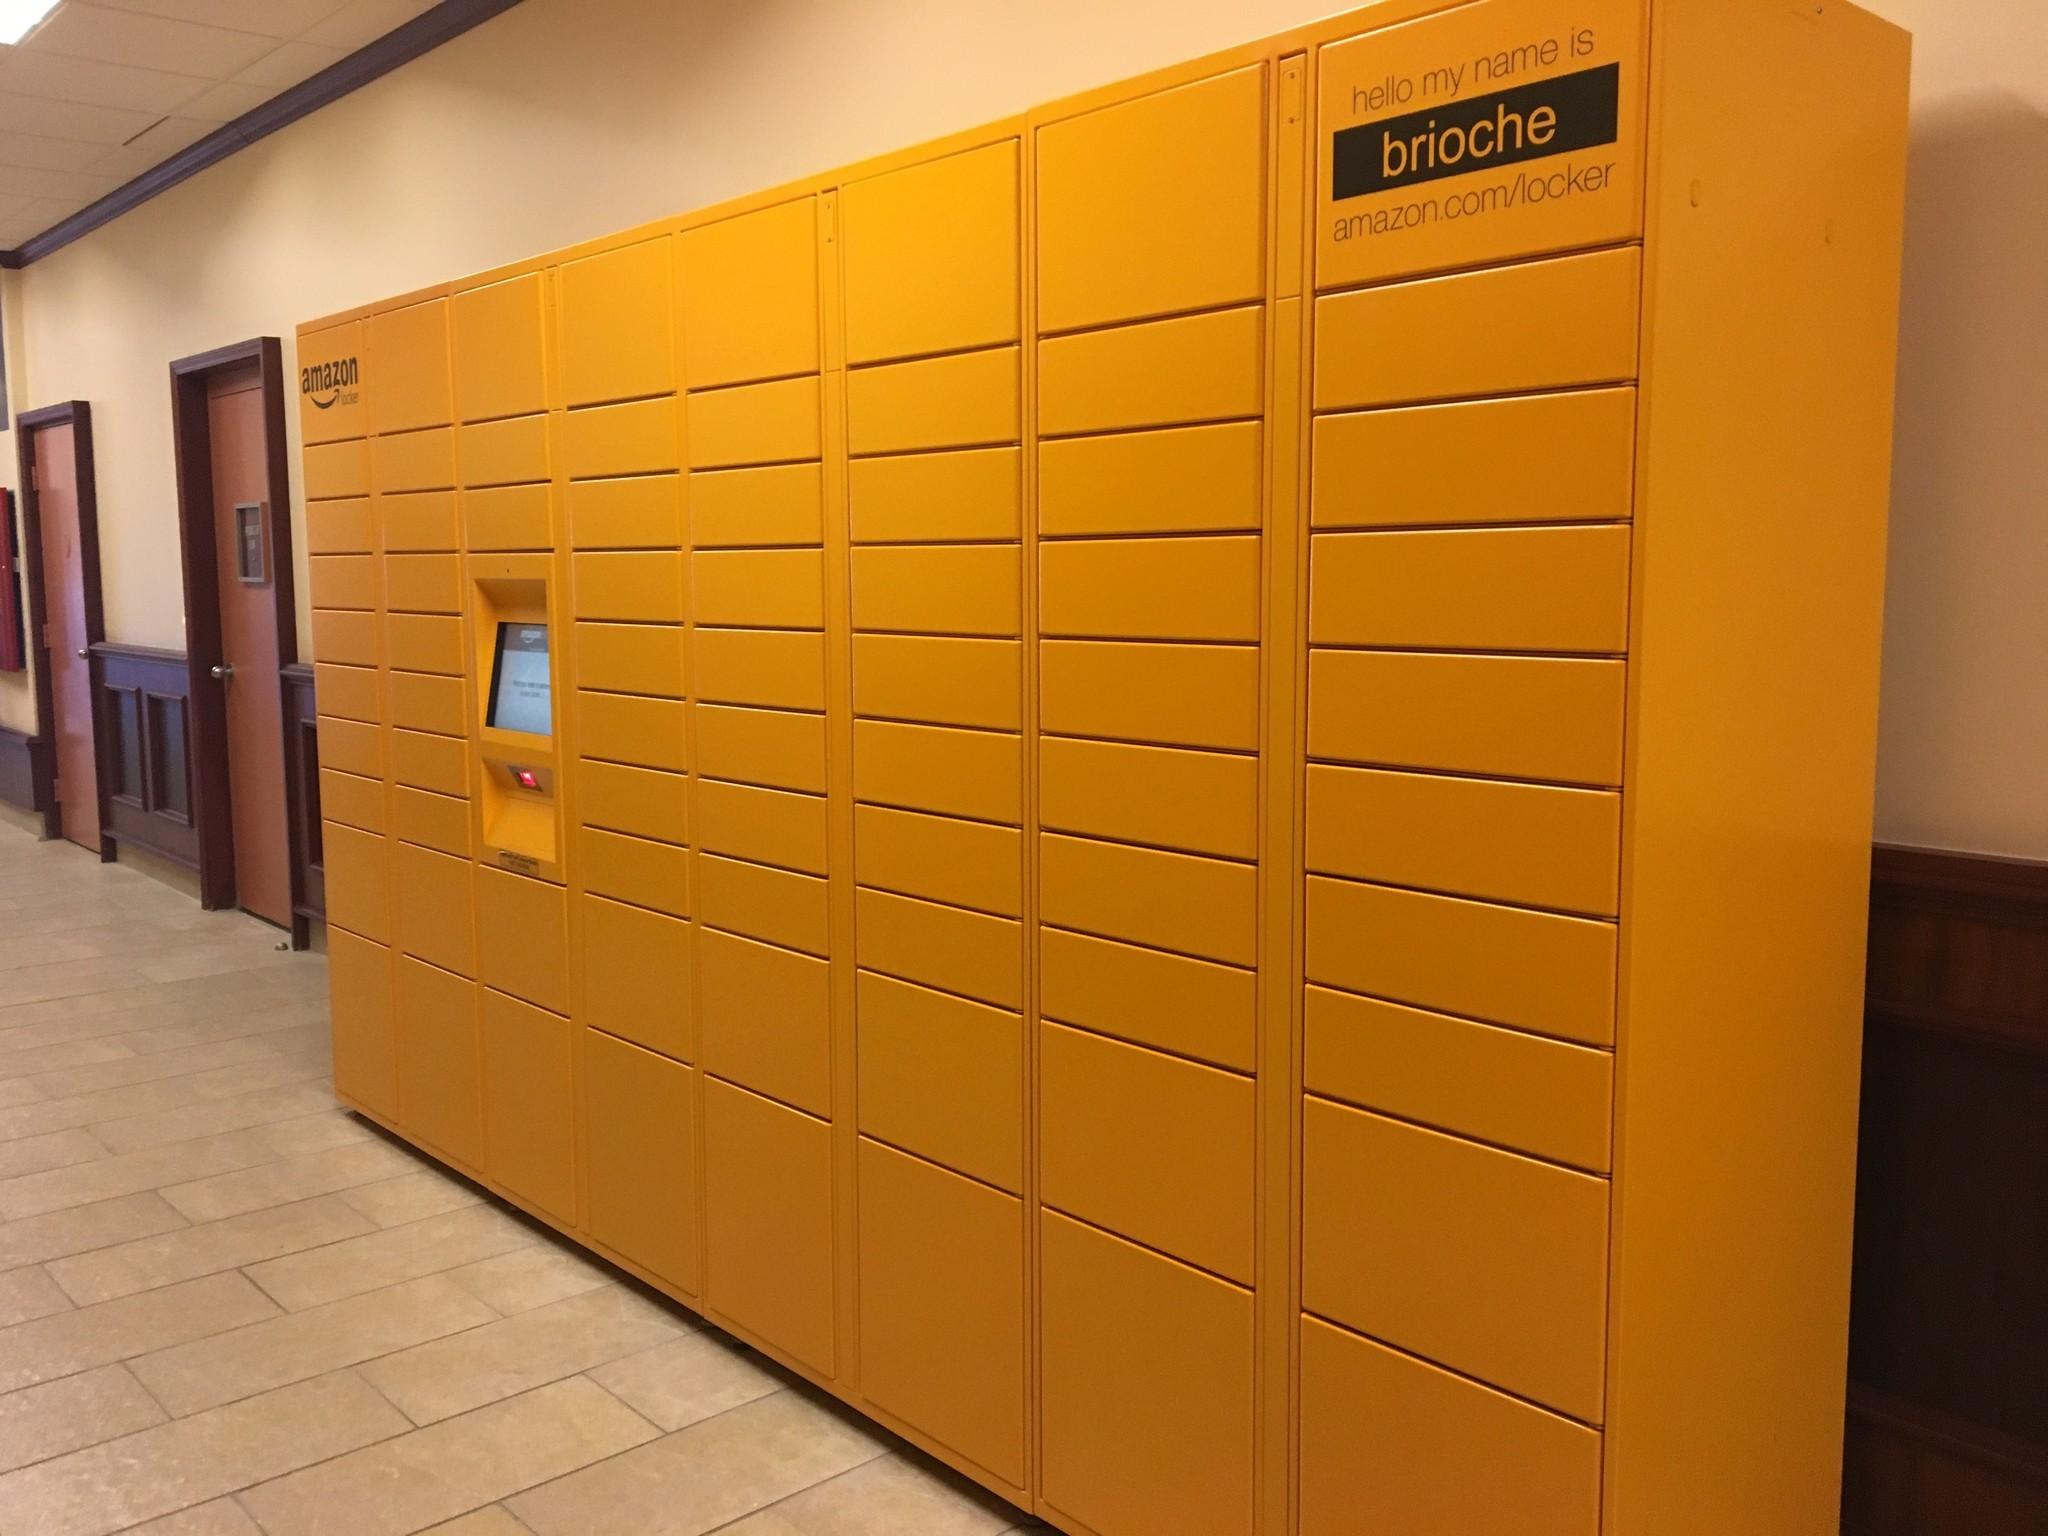 amazon lockers reach the peninsula daily press. Black Bedroom Furniture Sets. Home Design Ideas